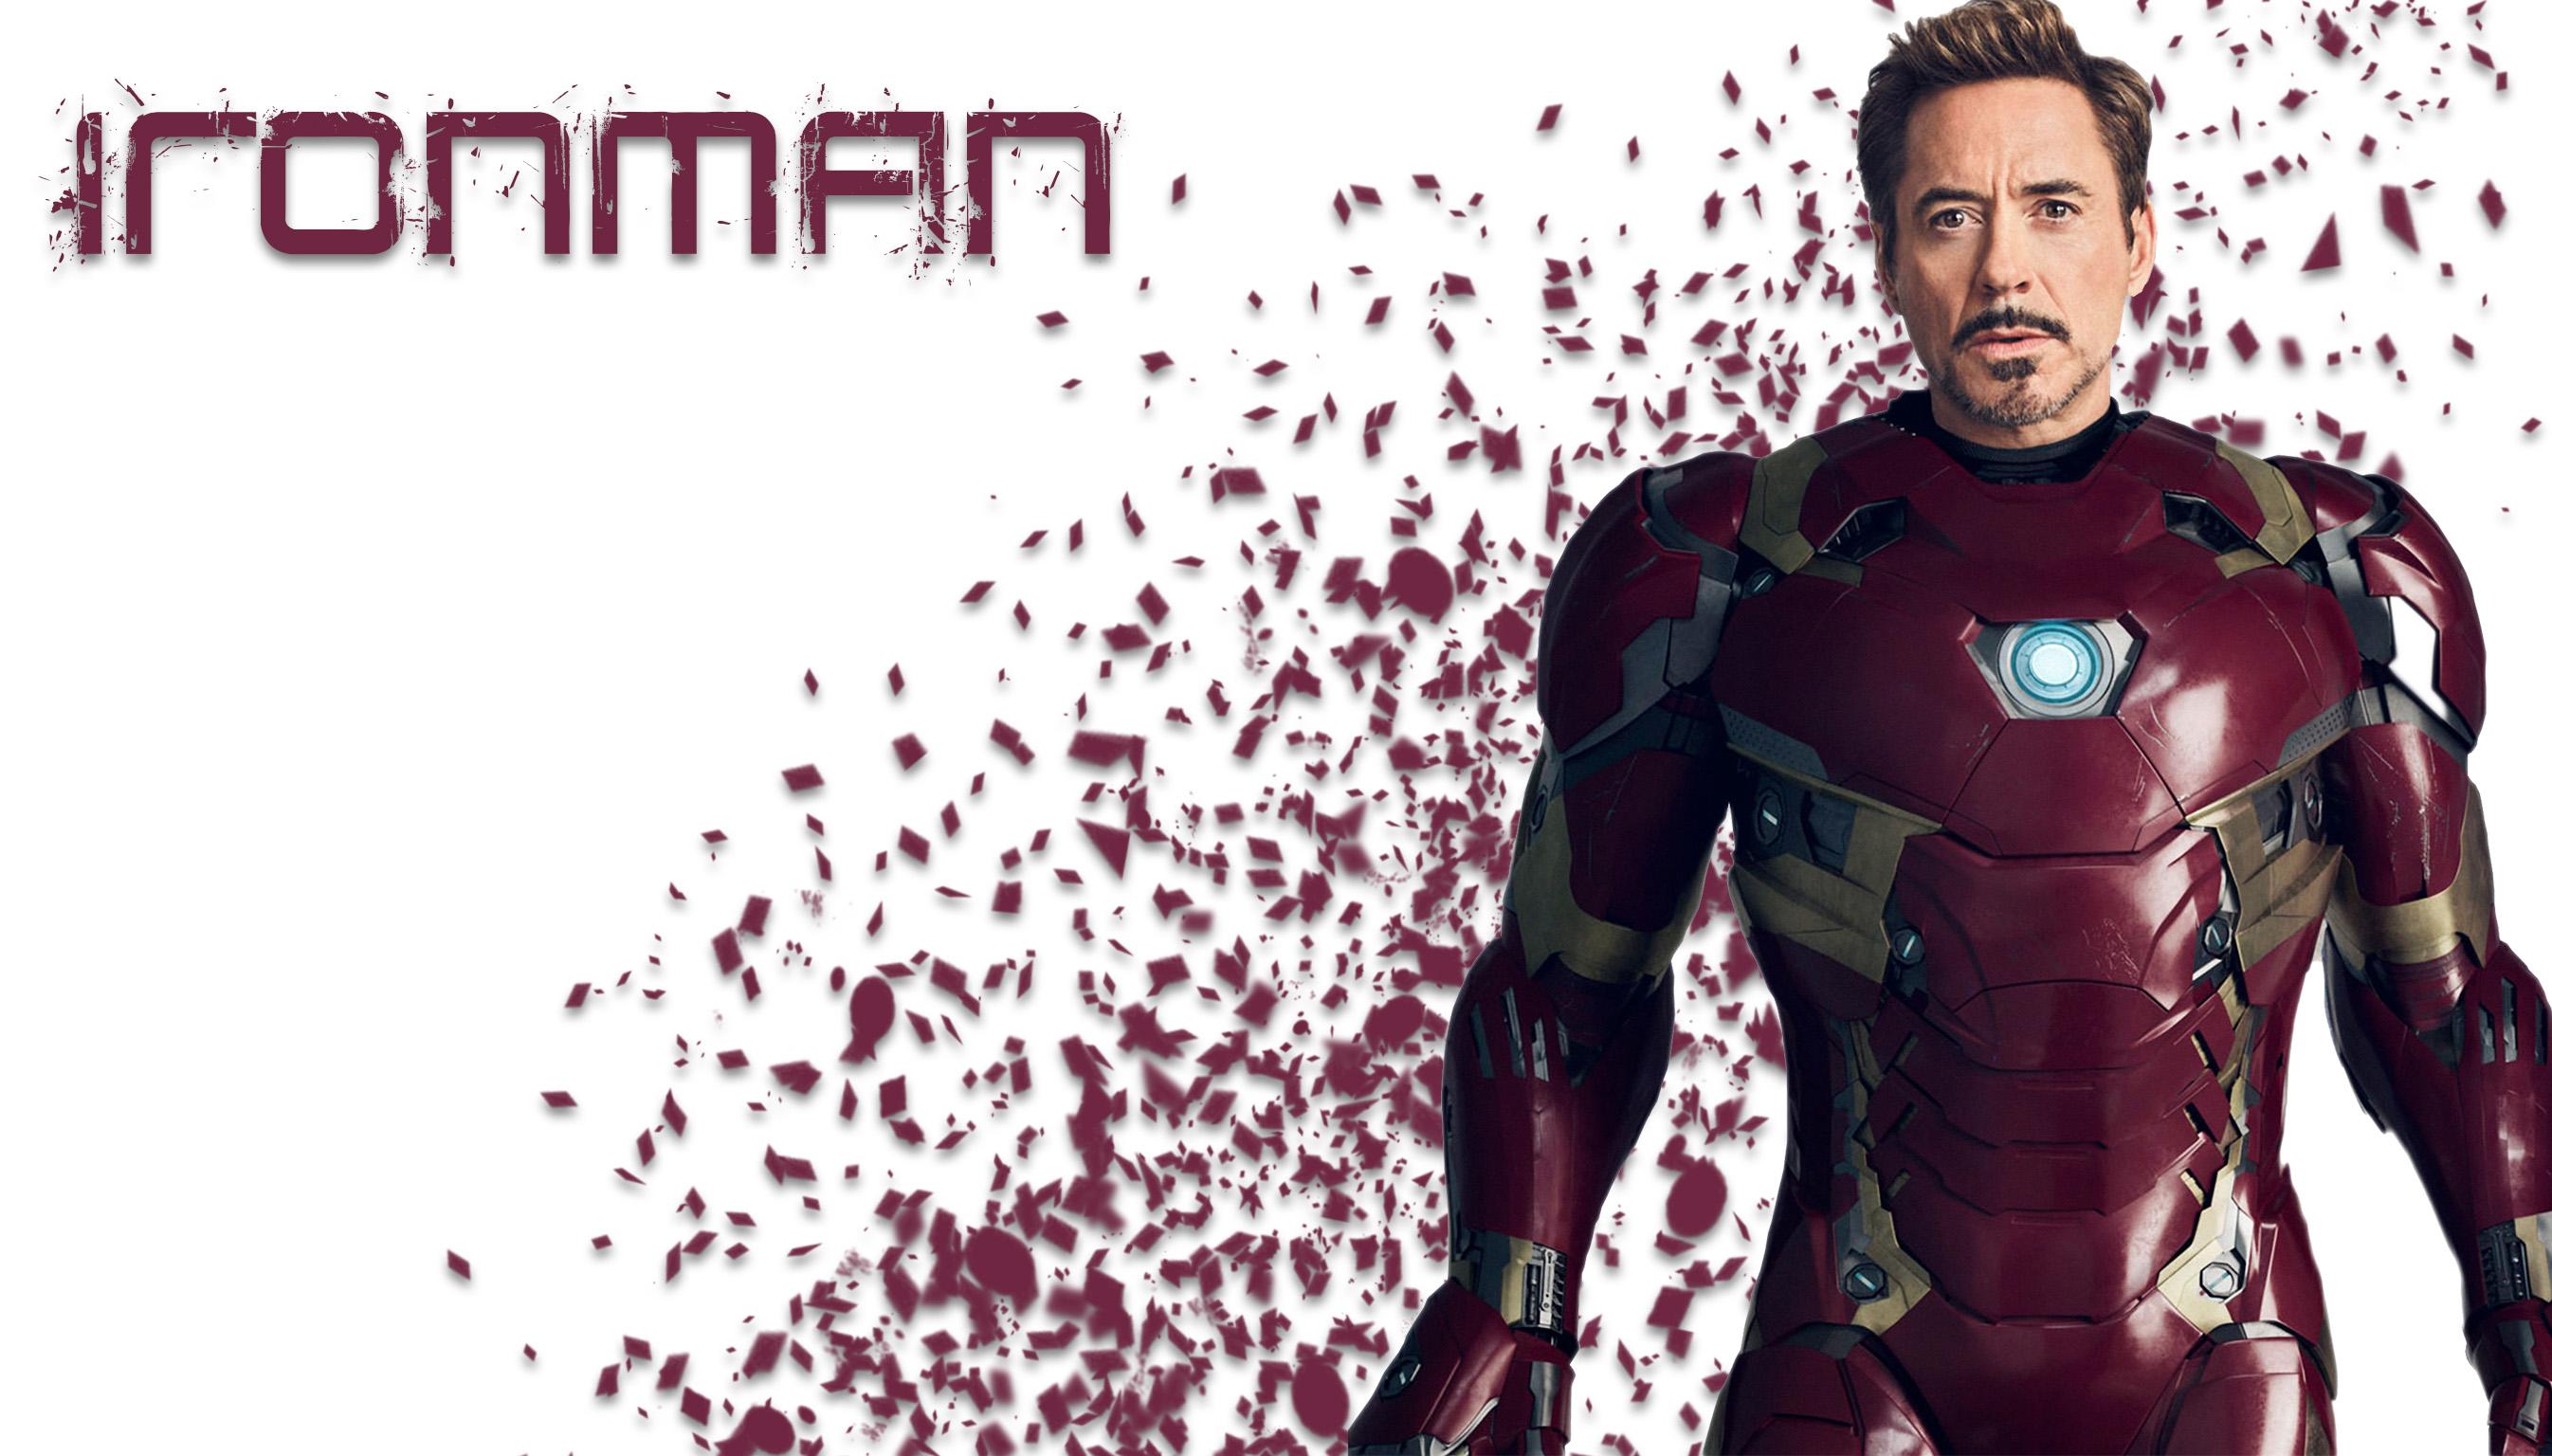 Iron Man Hd Wallpaper Hintergrund 2692x1536 Id913723